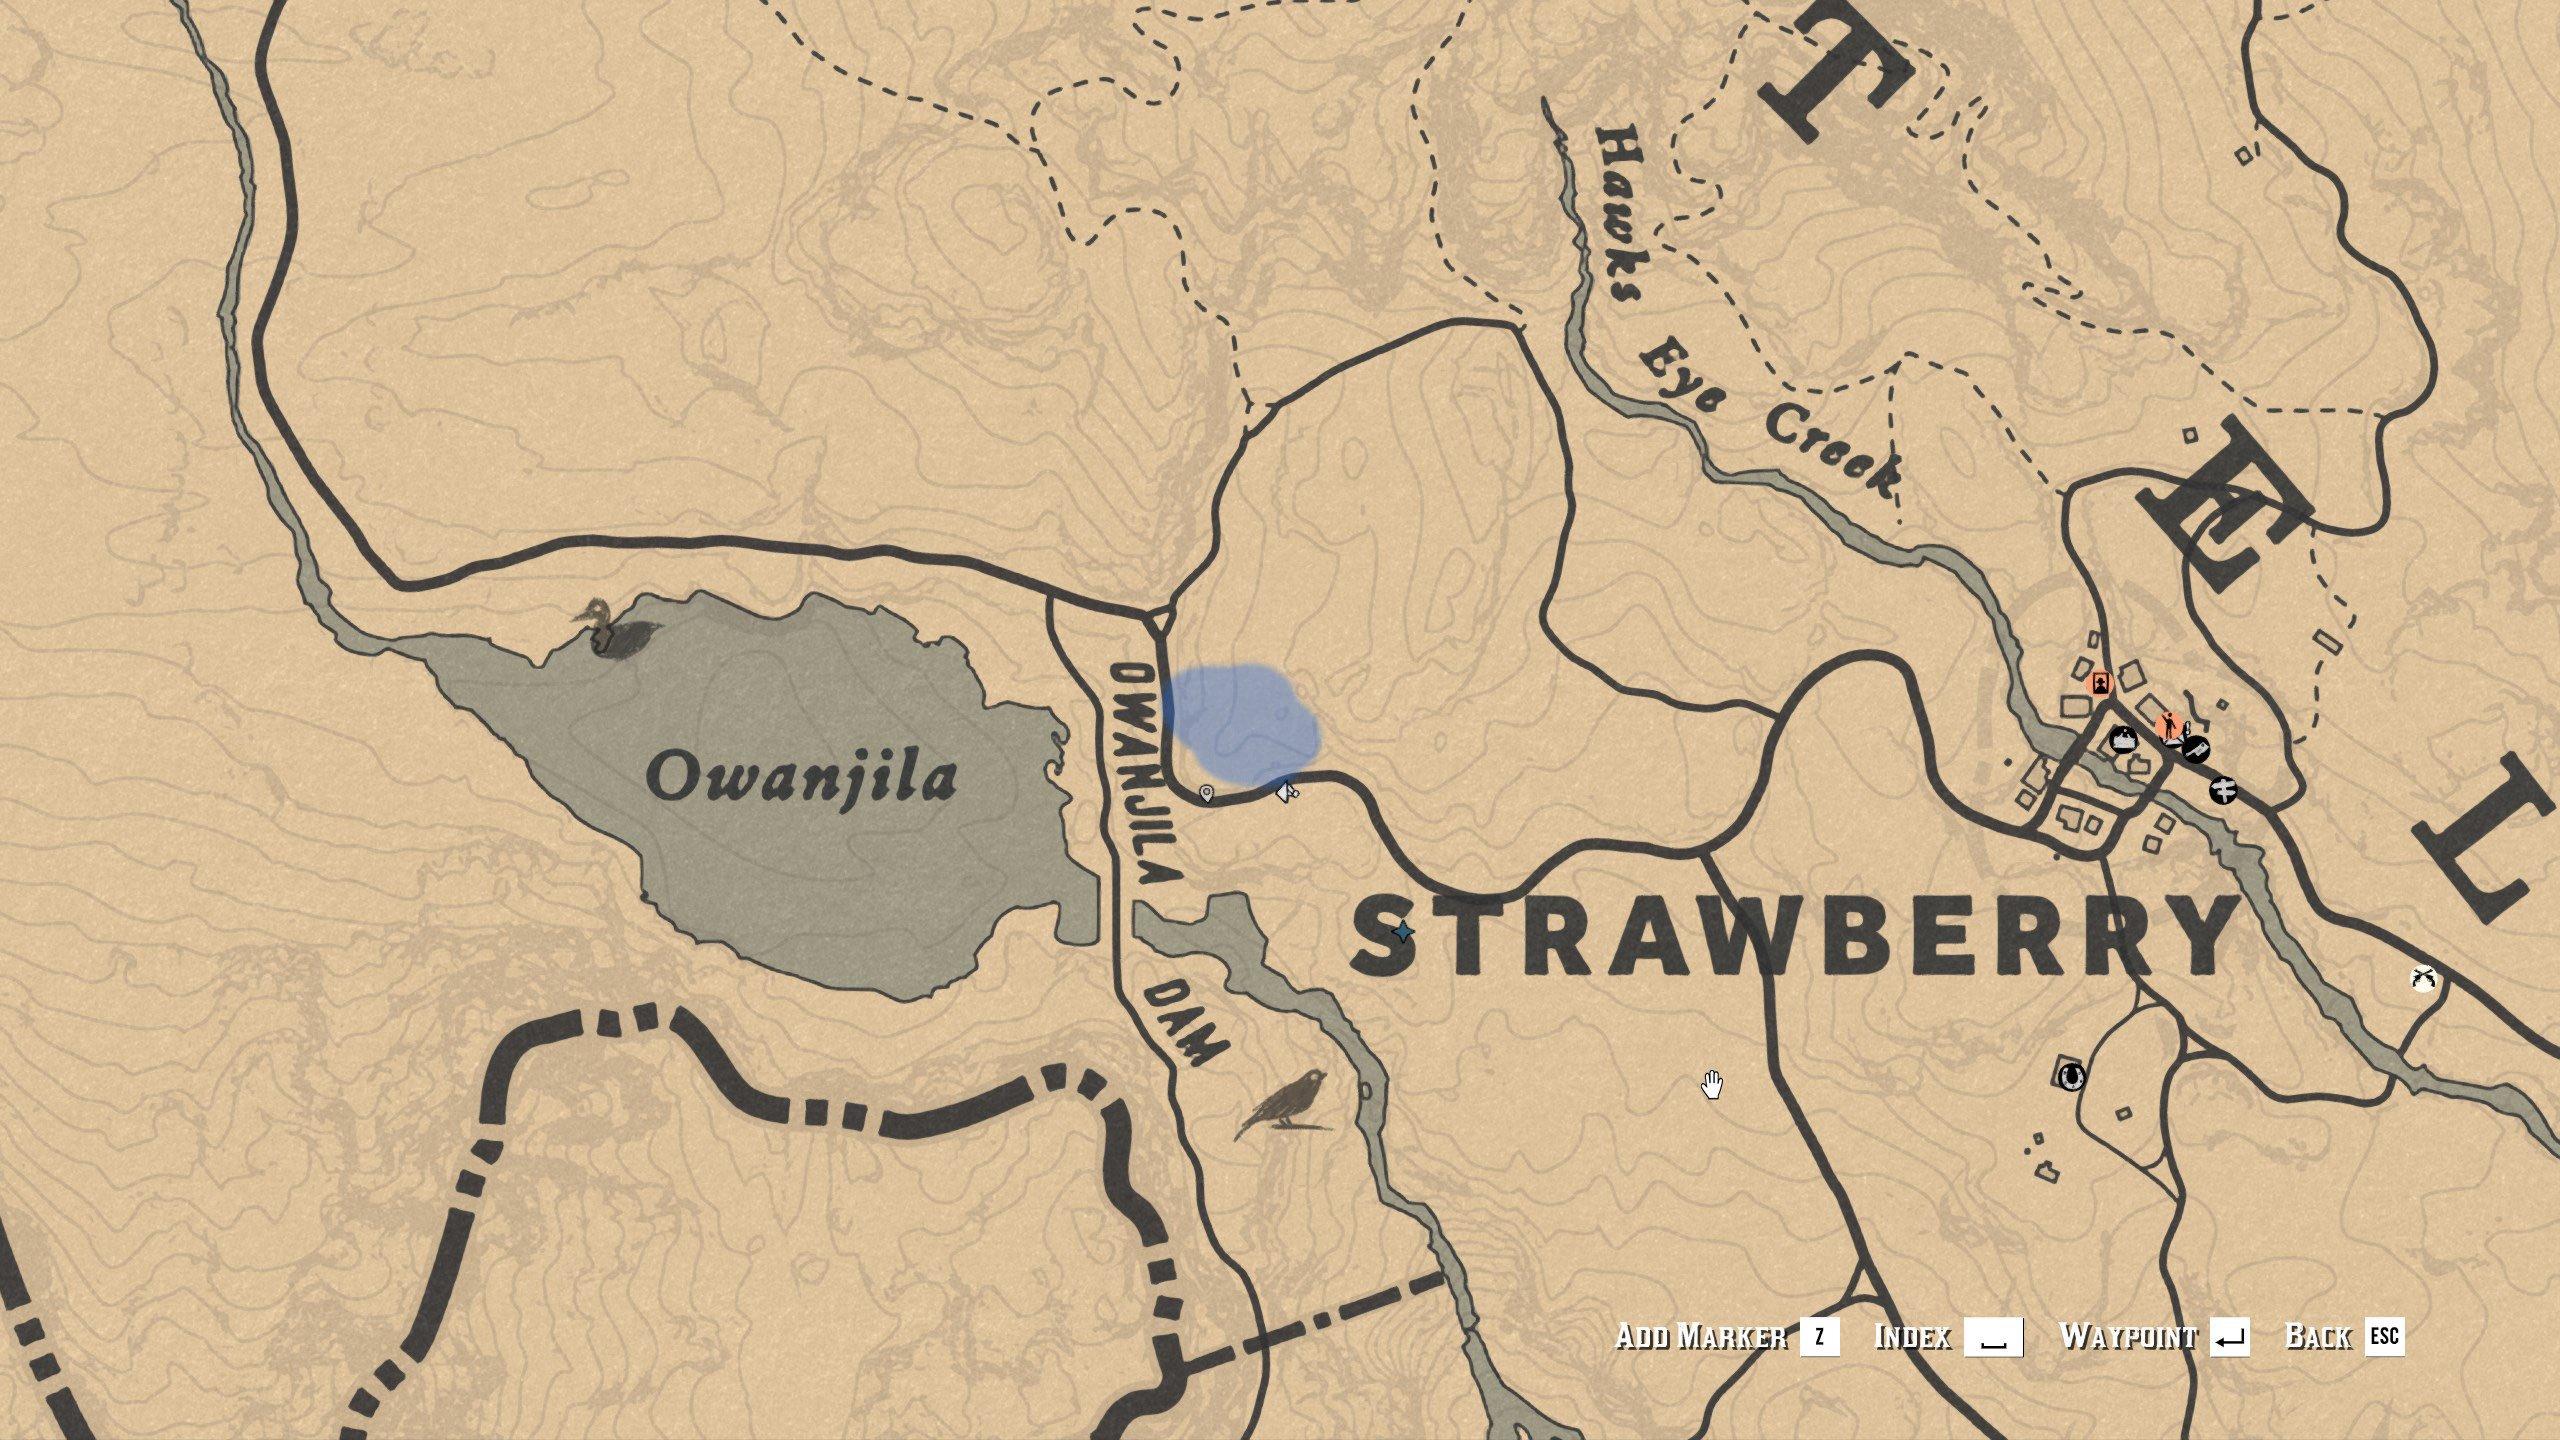 Eagle location - Owanjila Dam - RDR2